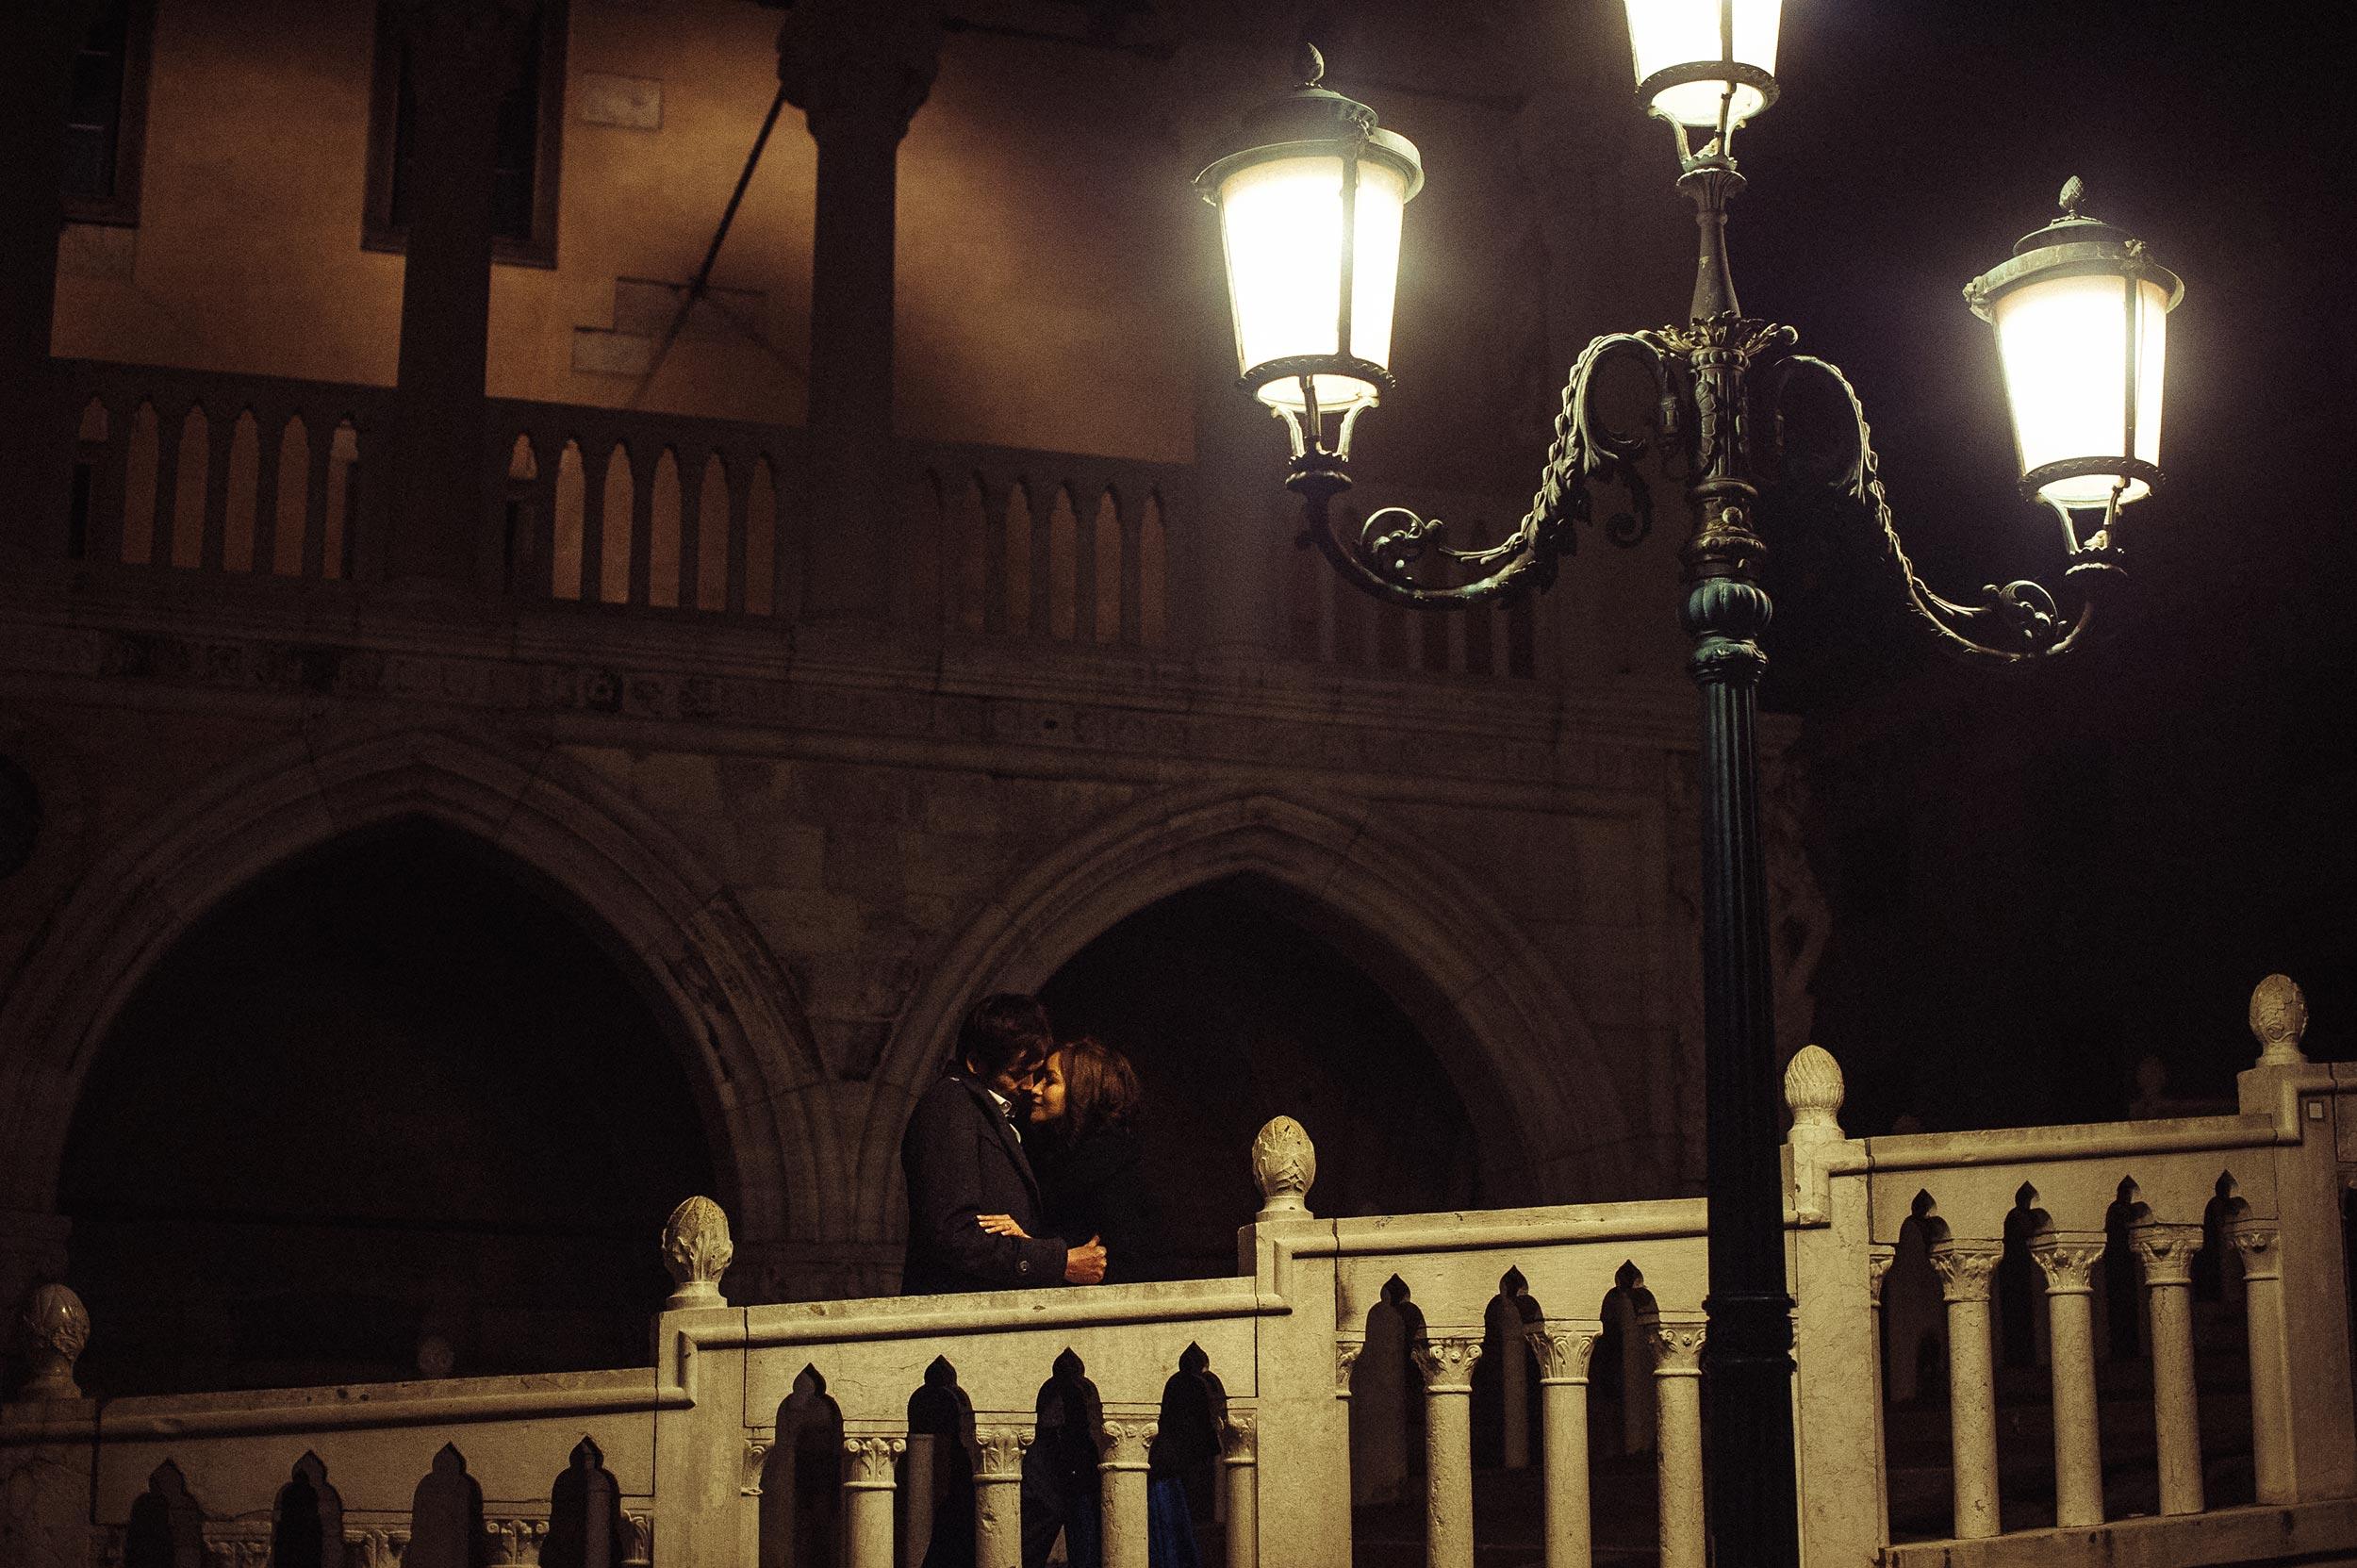 venice-love-portrait-at-night-under-a-public-lamp-winter-anniversary-honeymoon.jpg